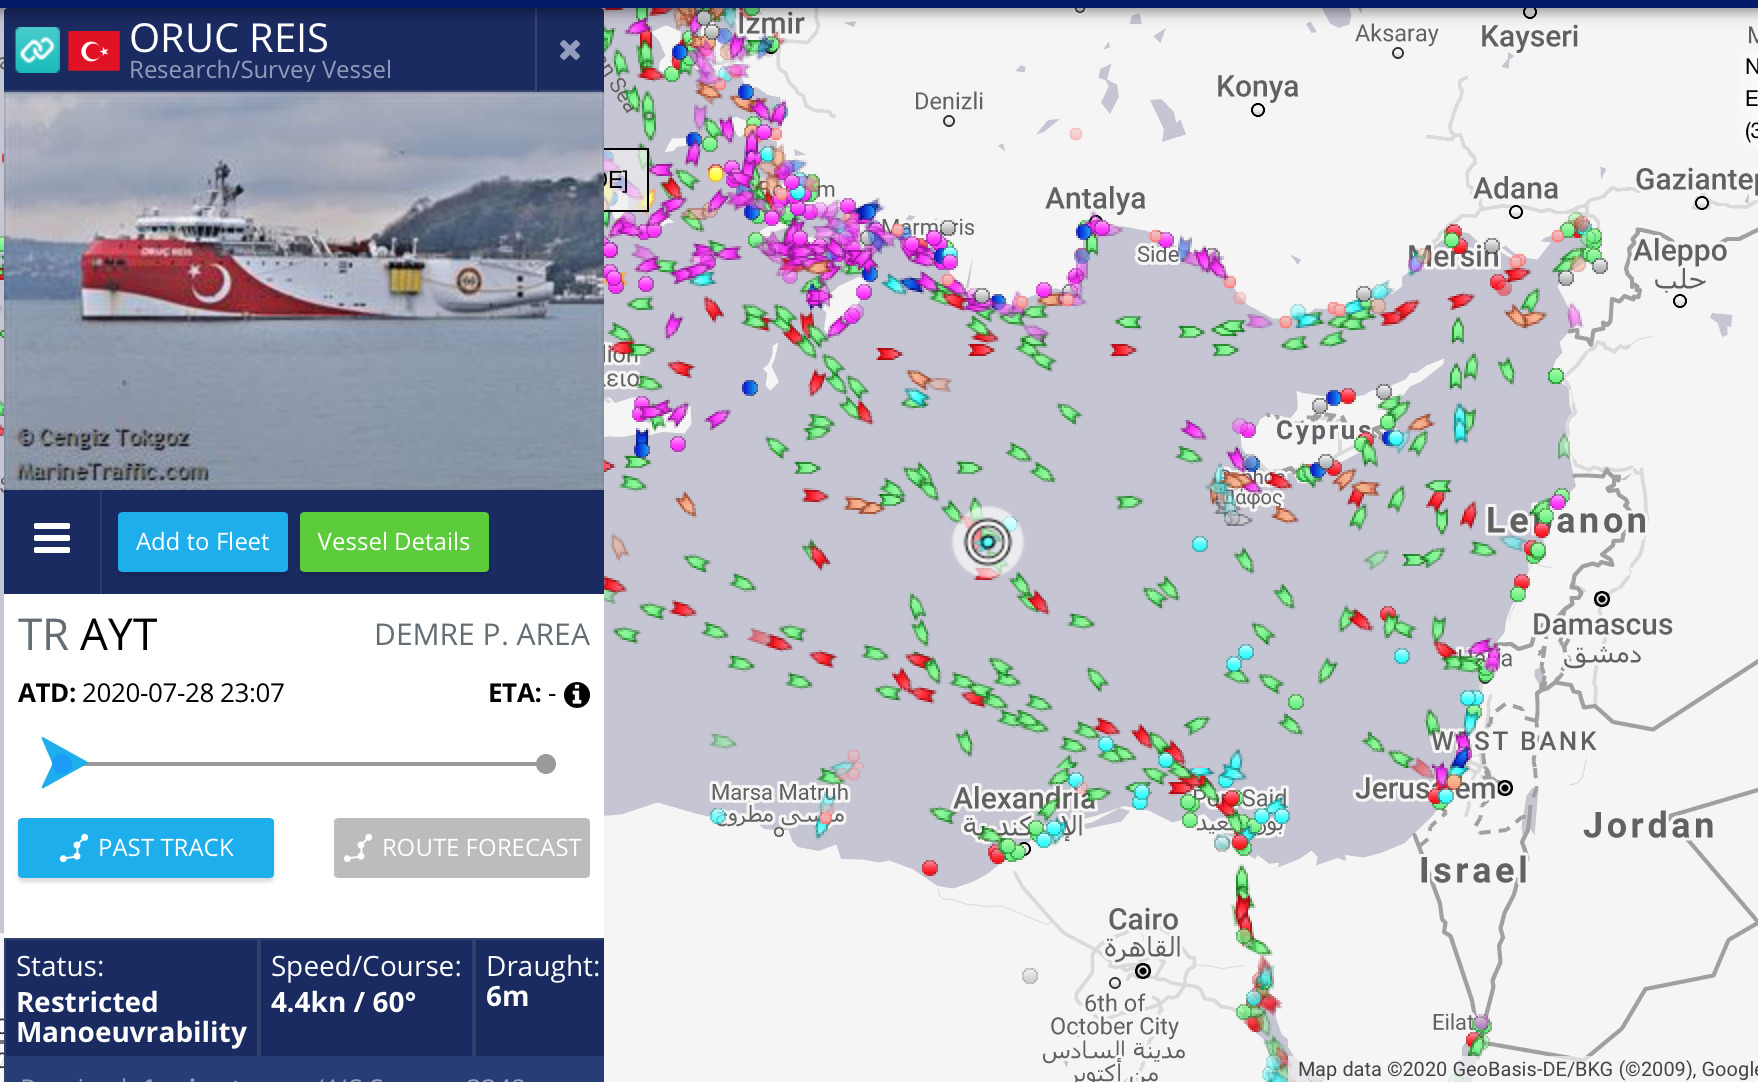 Position on 24 August 2020 of the Turkish exploration vessel Oruc Reis